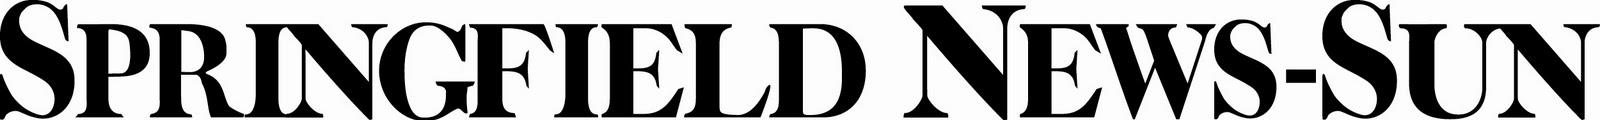 Springfield_News-Sun_logo.png